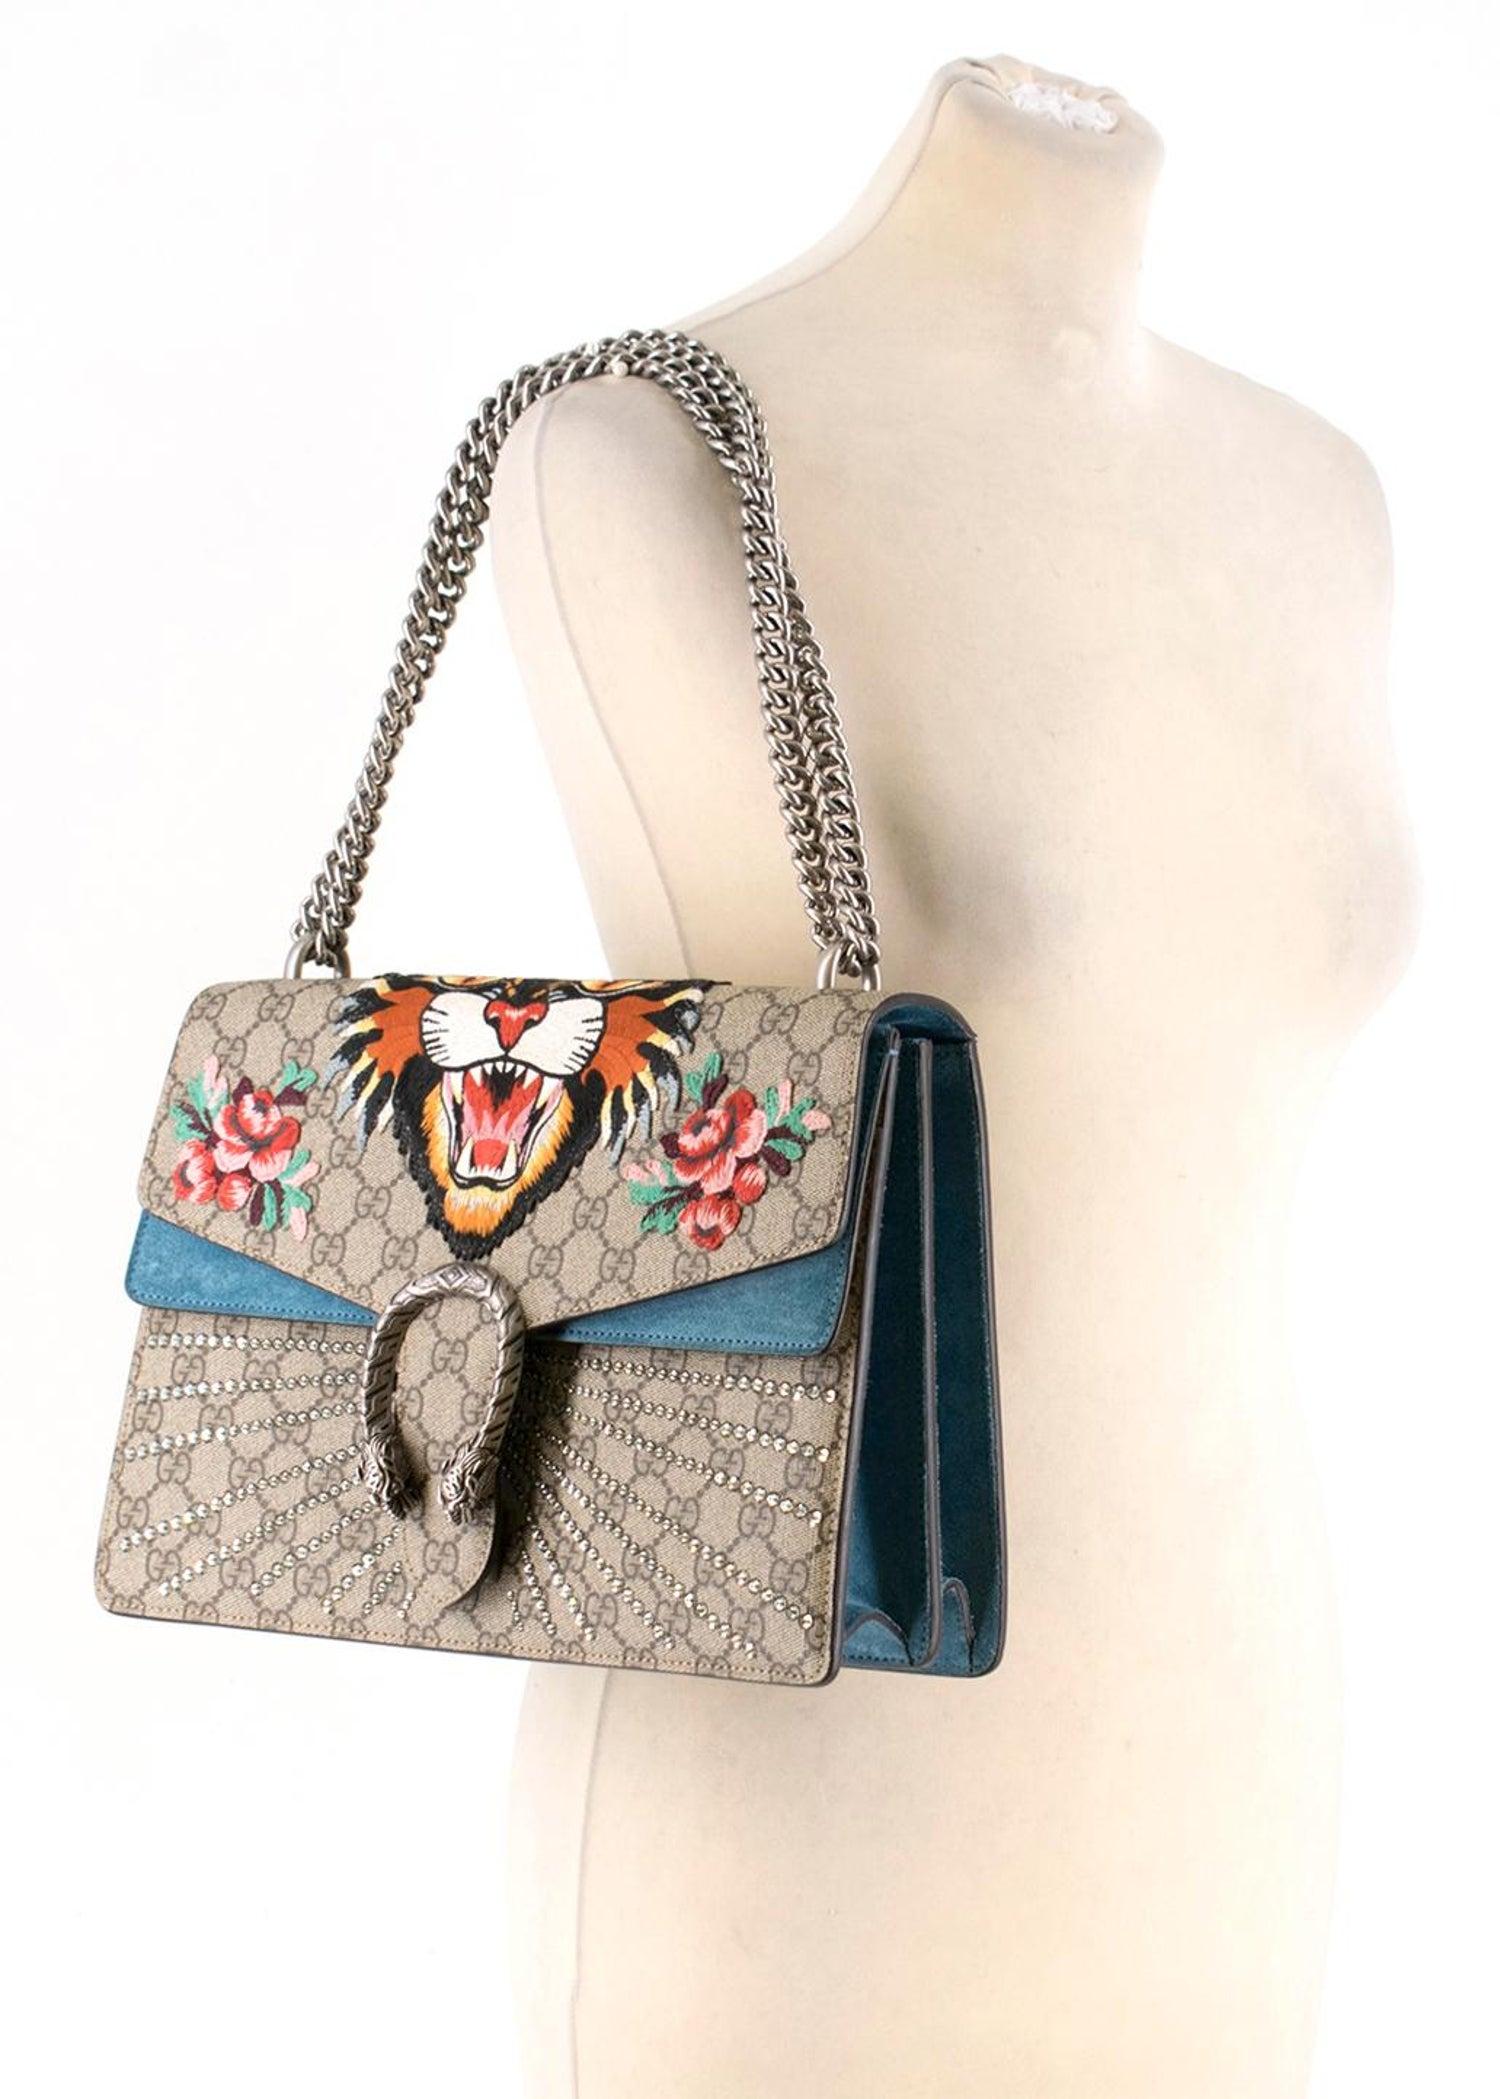 b327b73b27ea Gucci Dionysus supreme medium tiger head embroidered shoulder bag For Sale  at 1stdibs